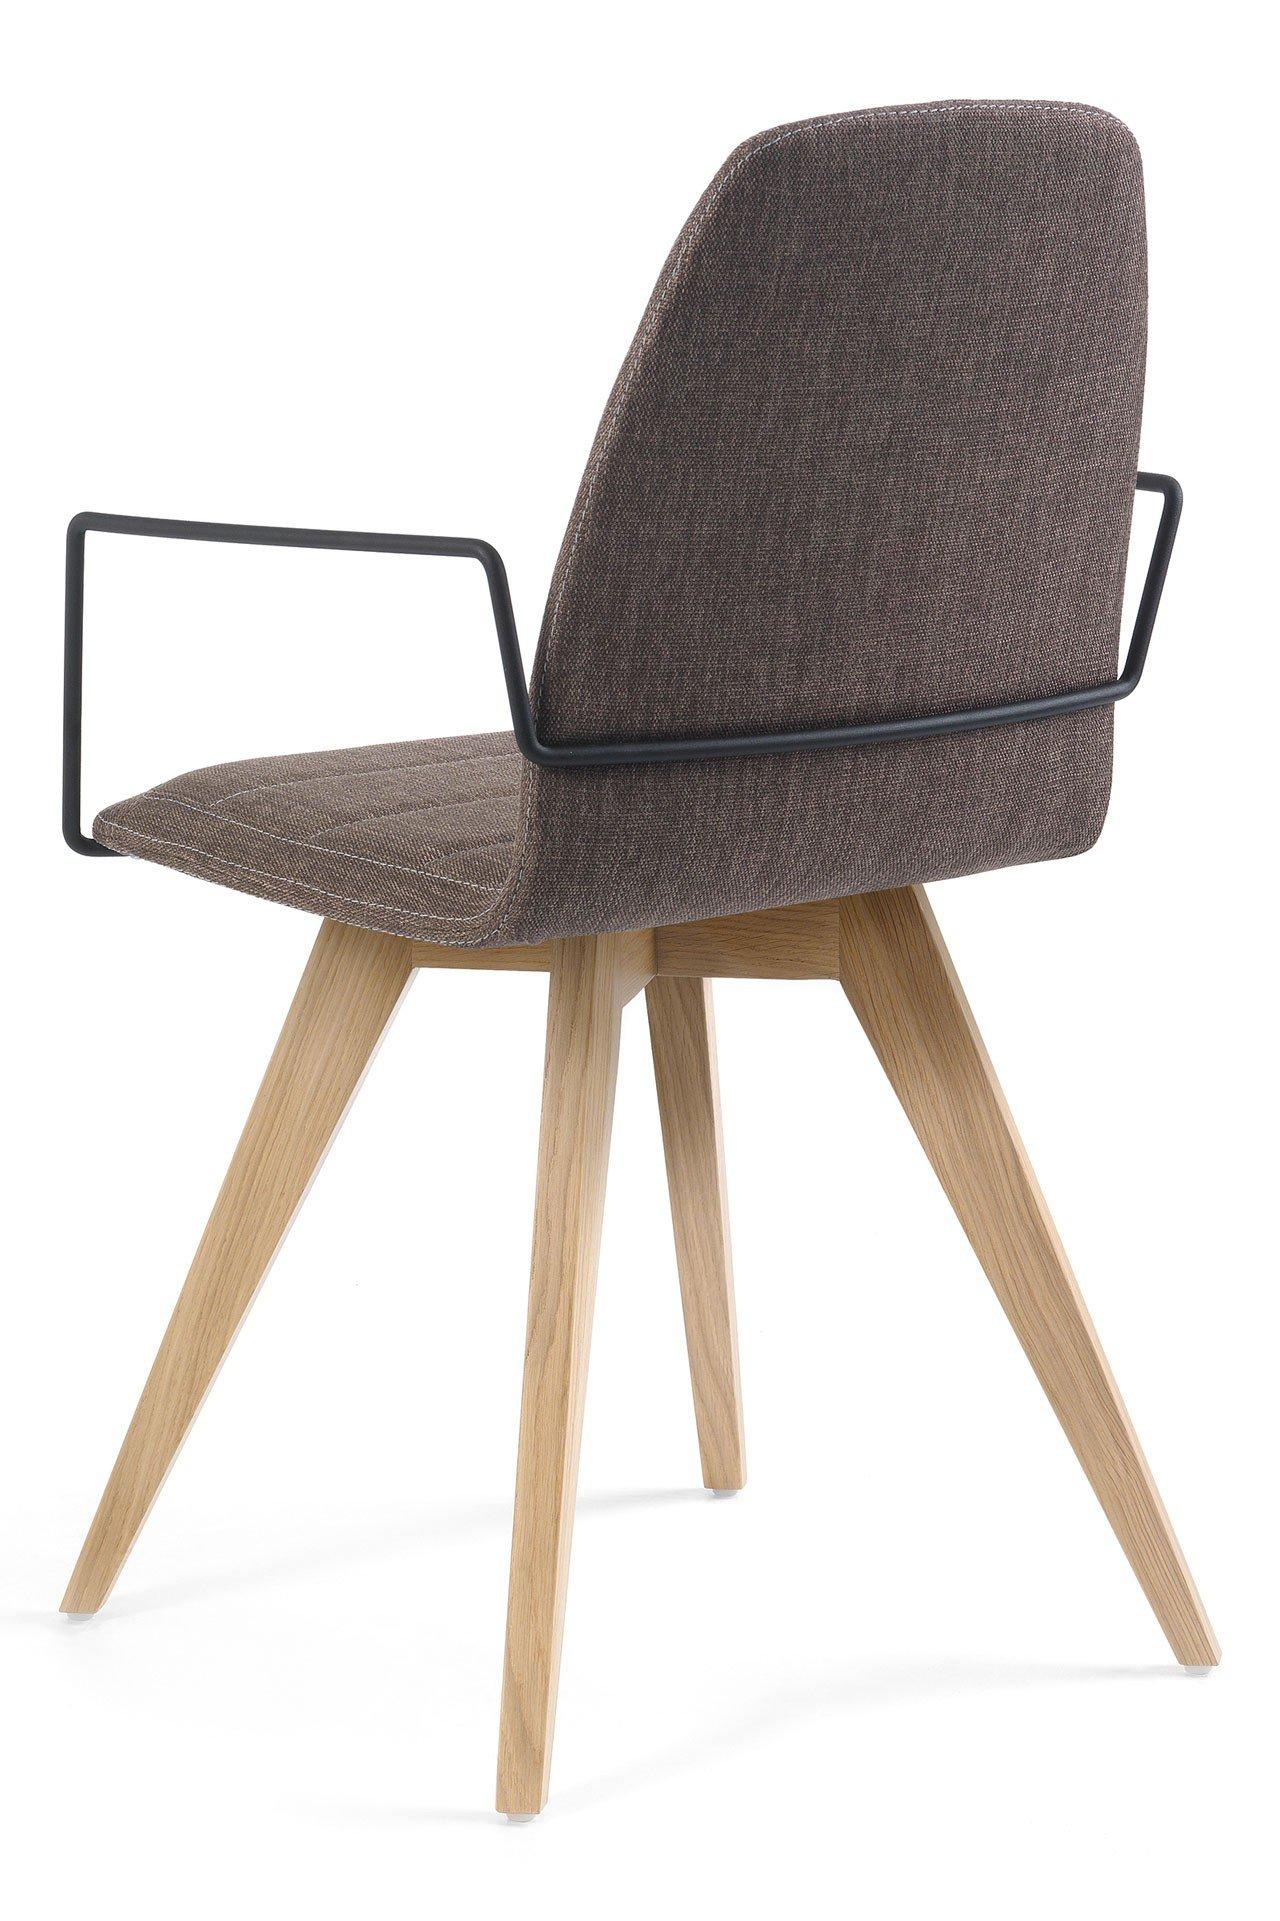 mobitec stuhl mood 14 uni eiche braun m bel letz ihr online shop. Black Bedroom Furniture Sets. Home Design Ideas